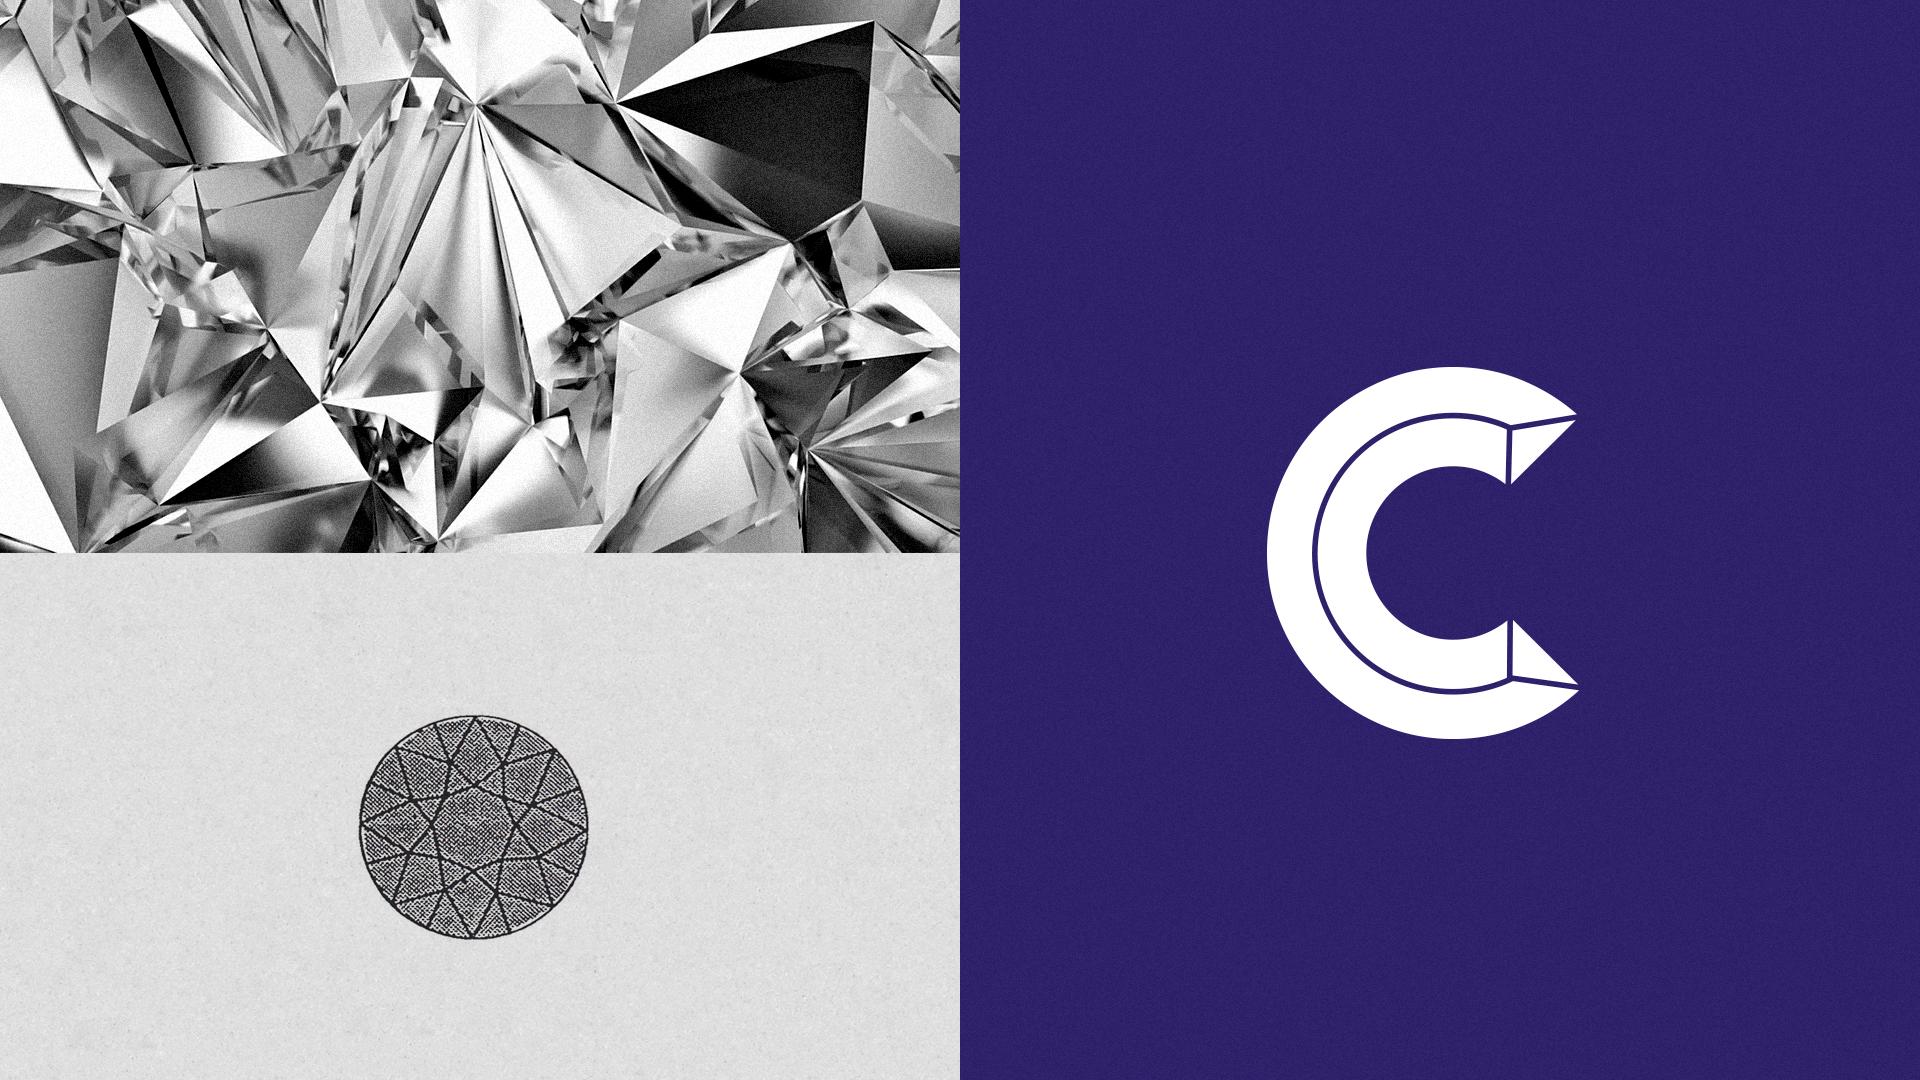 espacio-c-hair-lifestyle-identity-branding-10